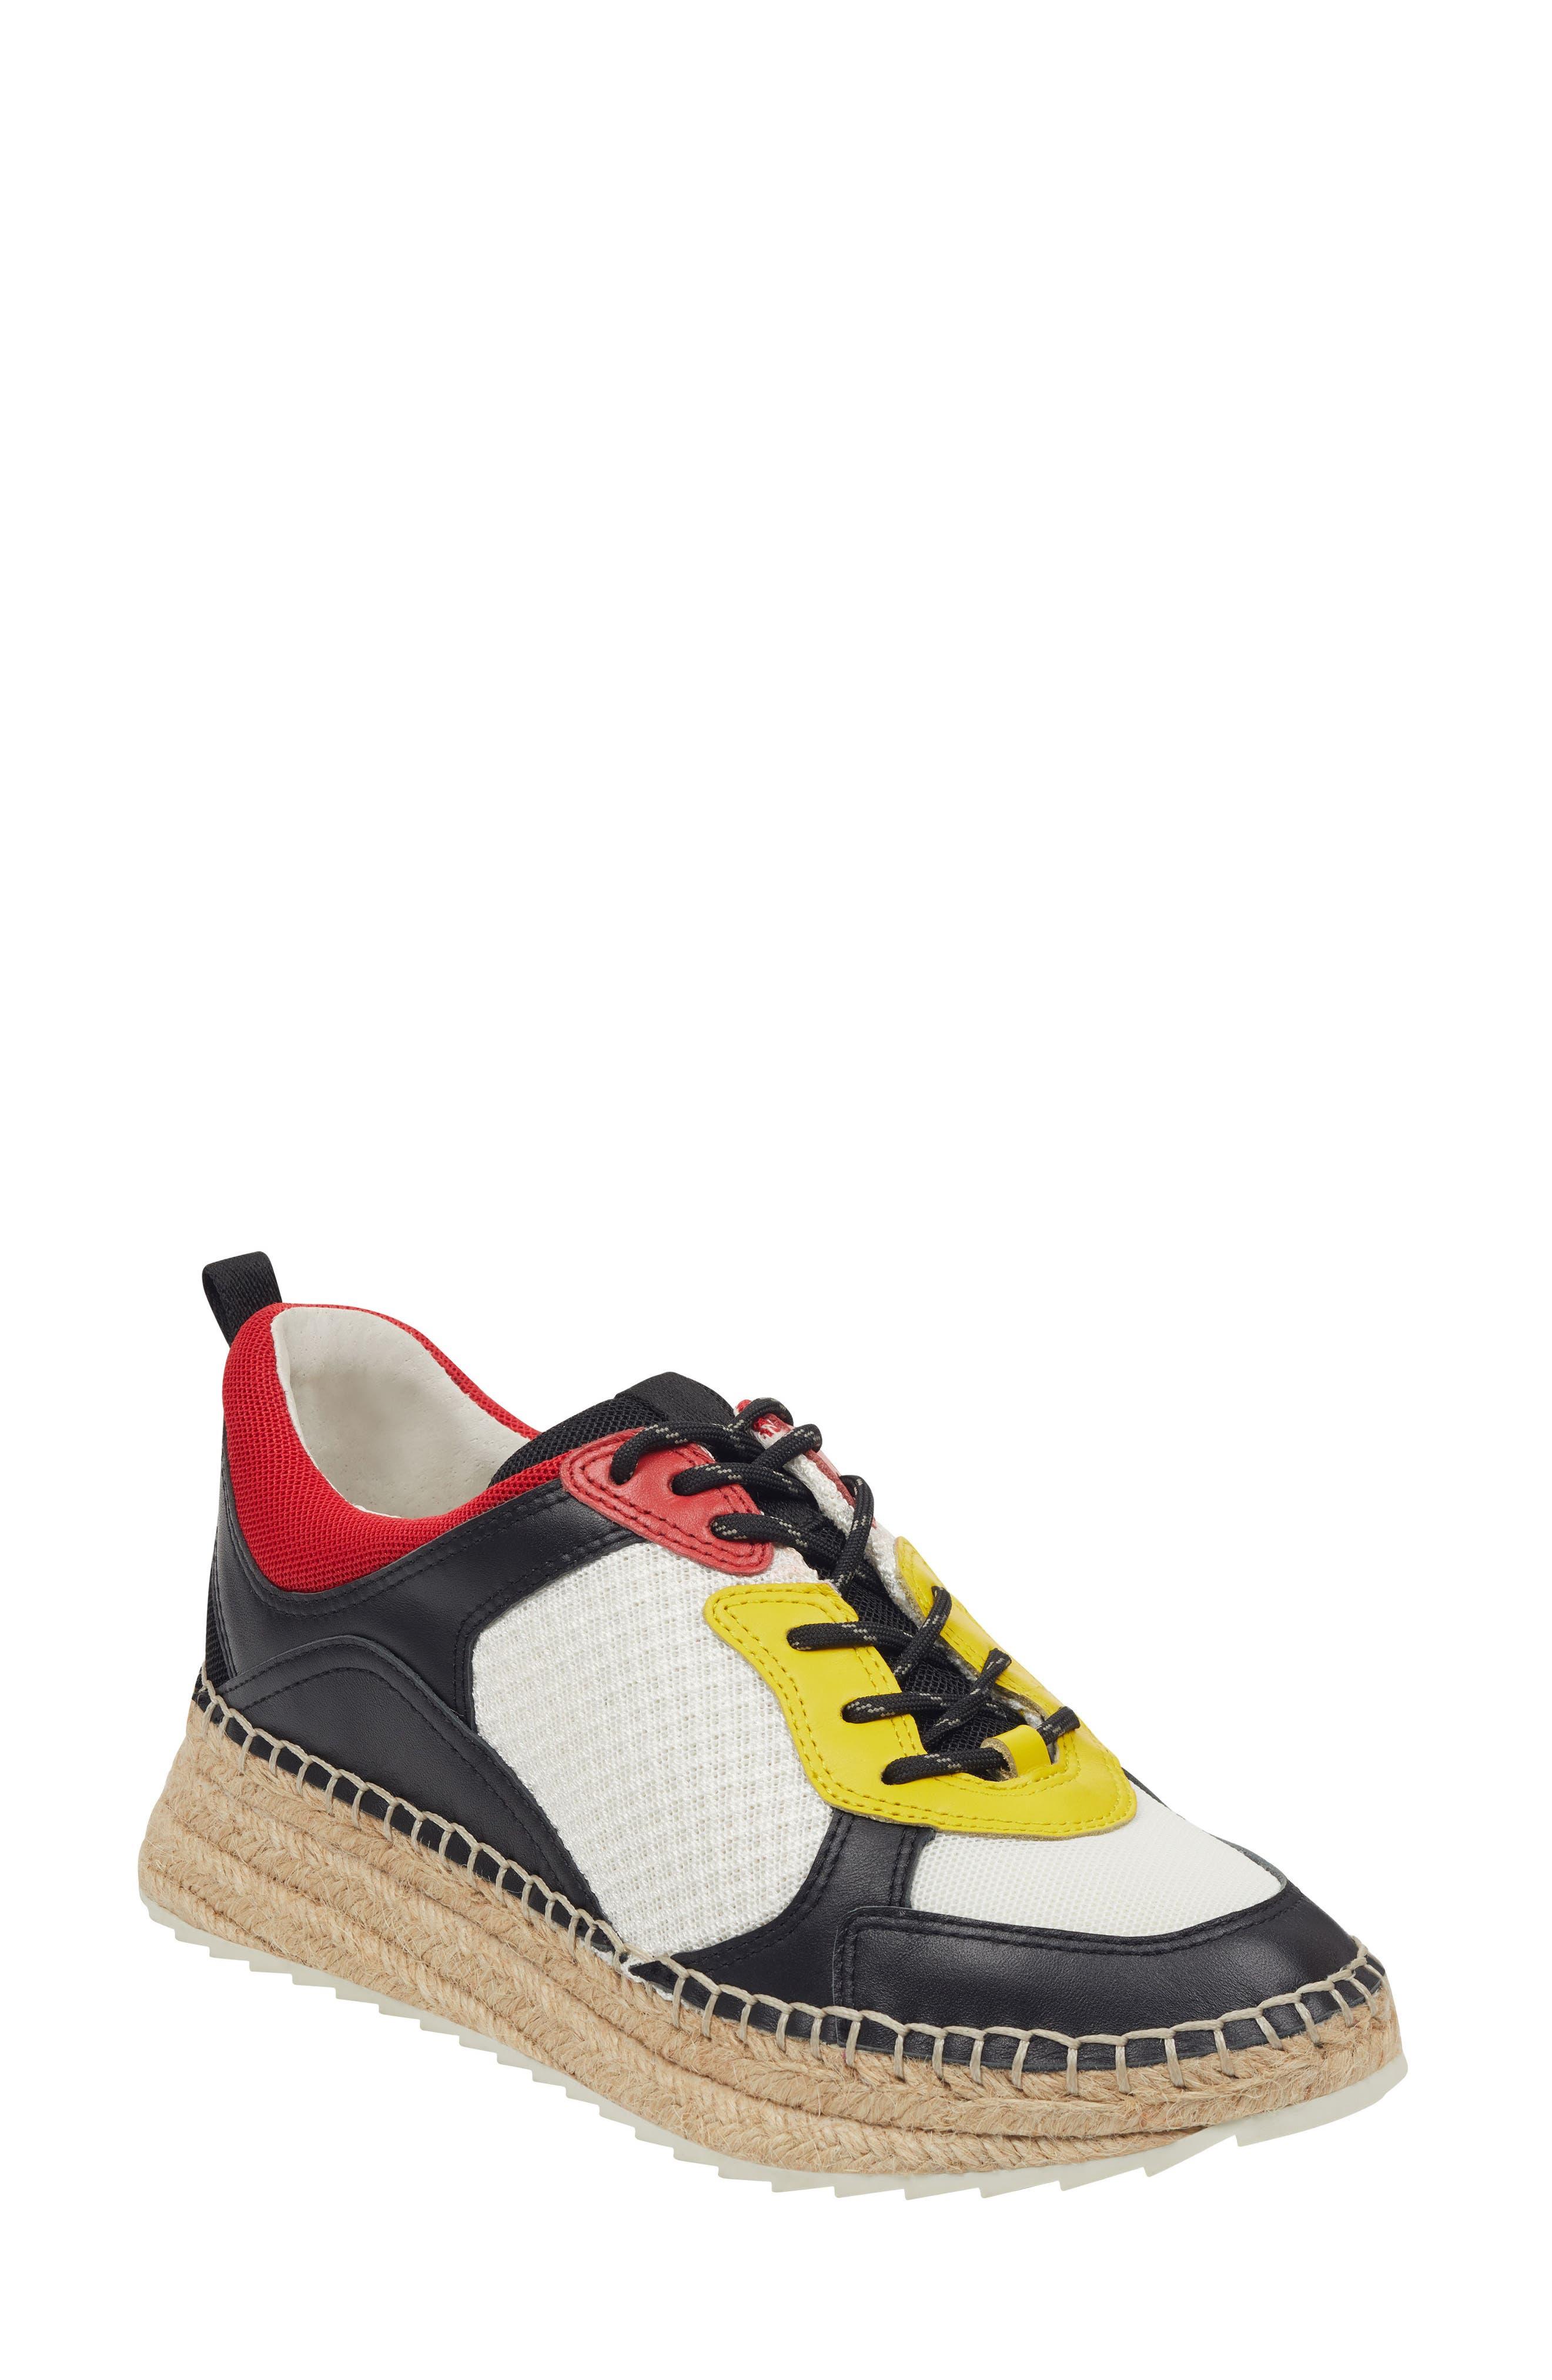 Janette Espadrille Sneaker, Main, color, 001